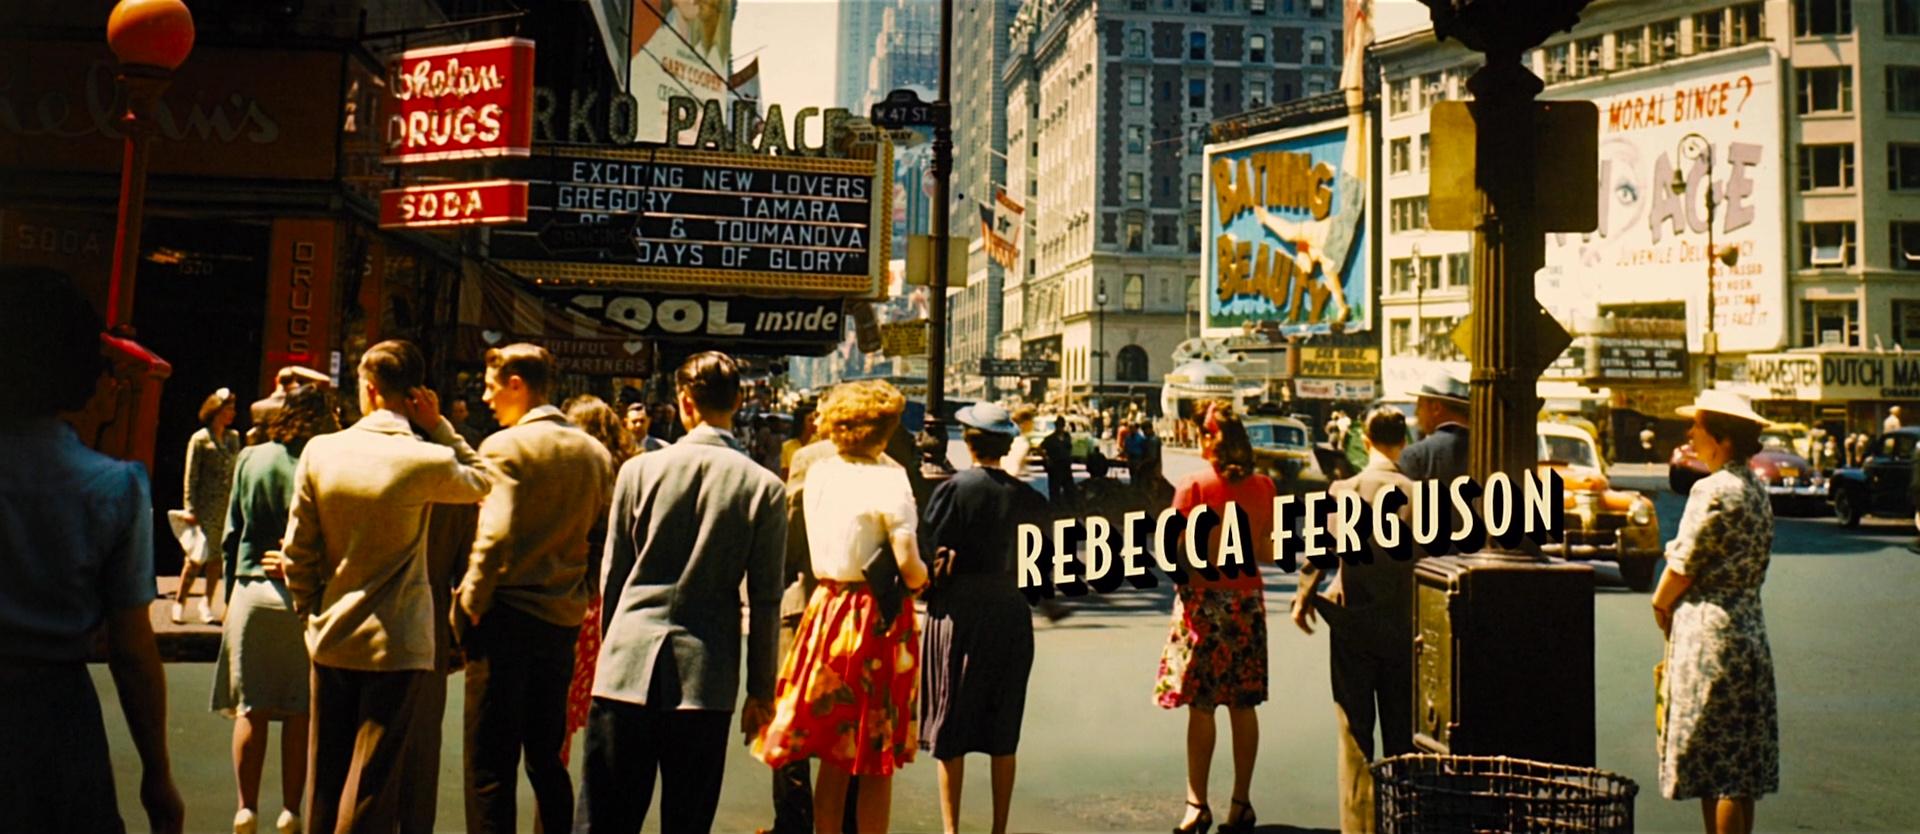 Florence Foster Jenkins film still